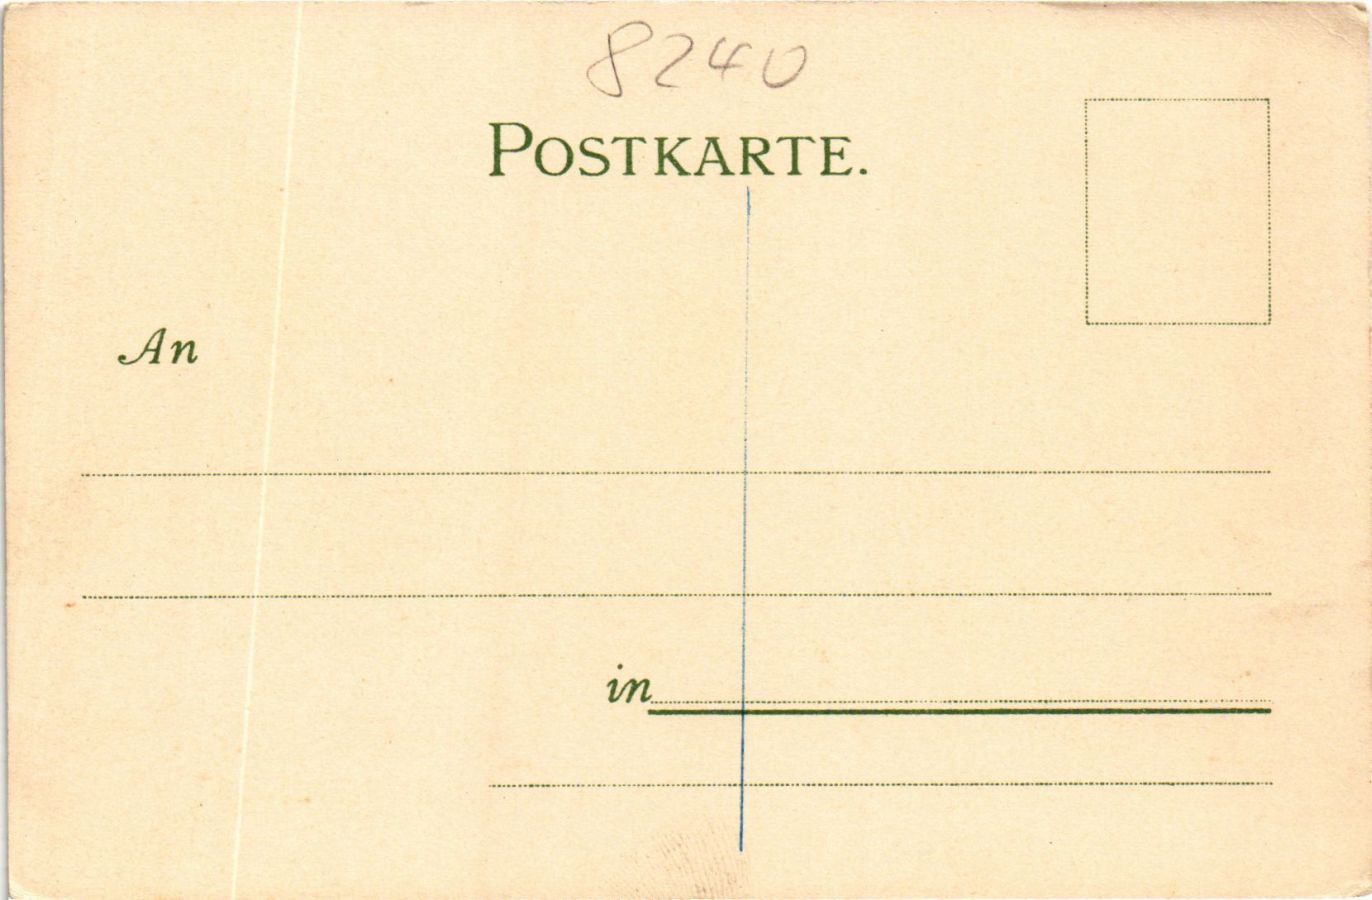 CPA-AK-Konigssee-Gruss-vom-Konigsee-GERMANY-879458 miniature 2